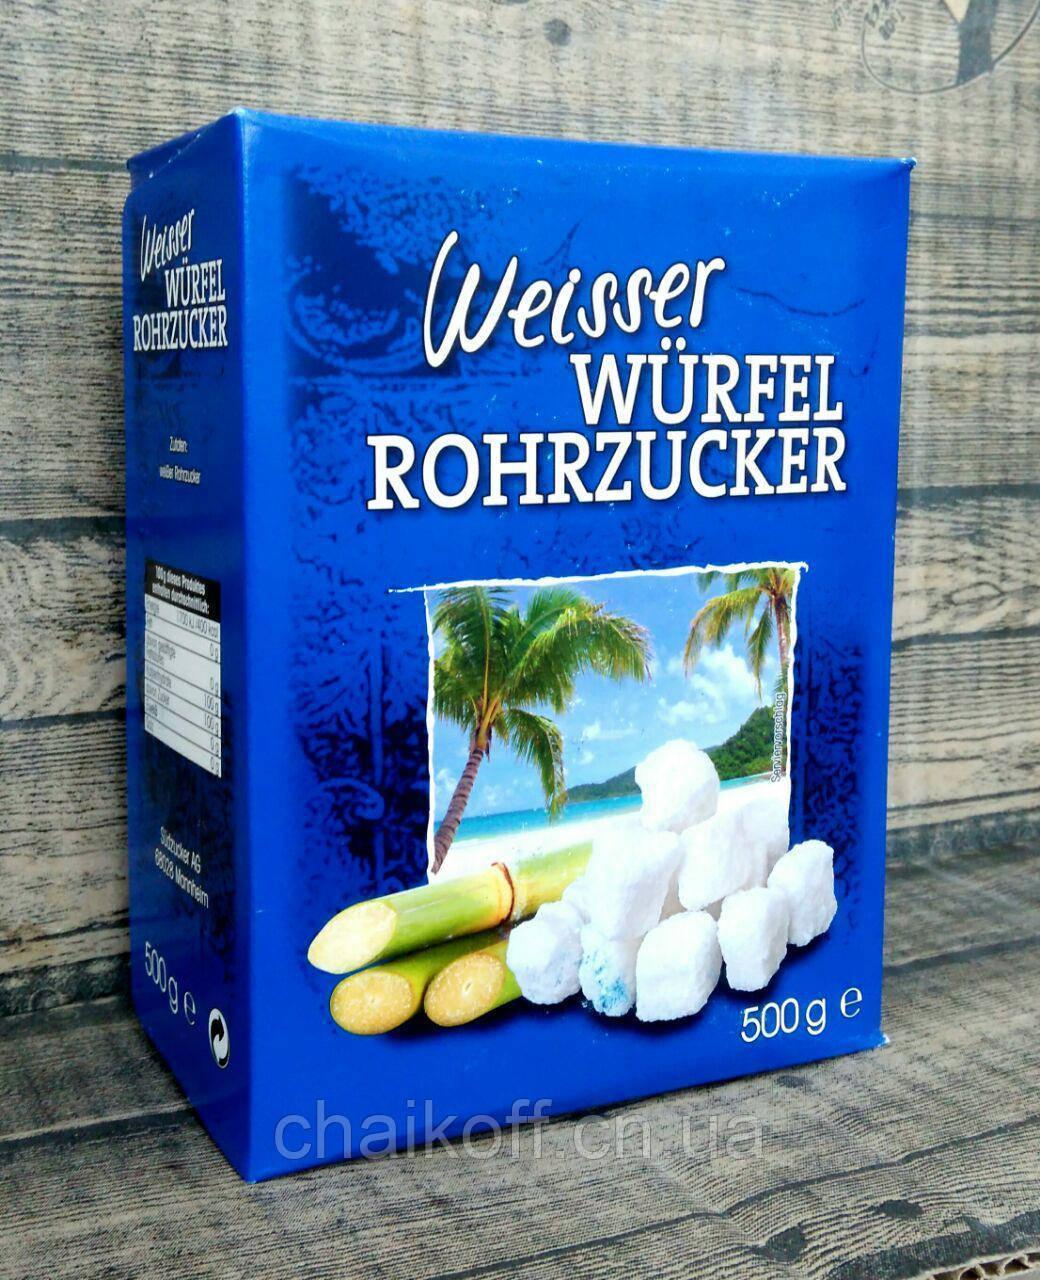 Сахар тростниковый белый Weisser Würfel Rohrzucker 500 г  (Германия)